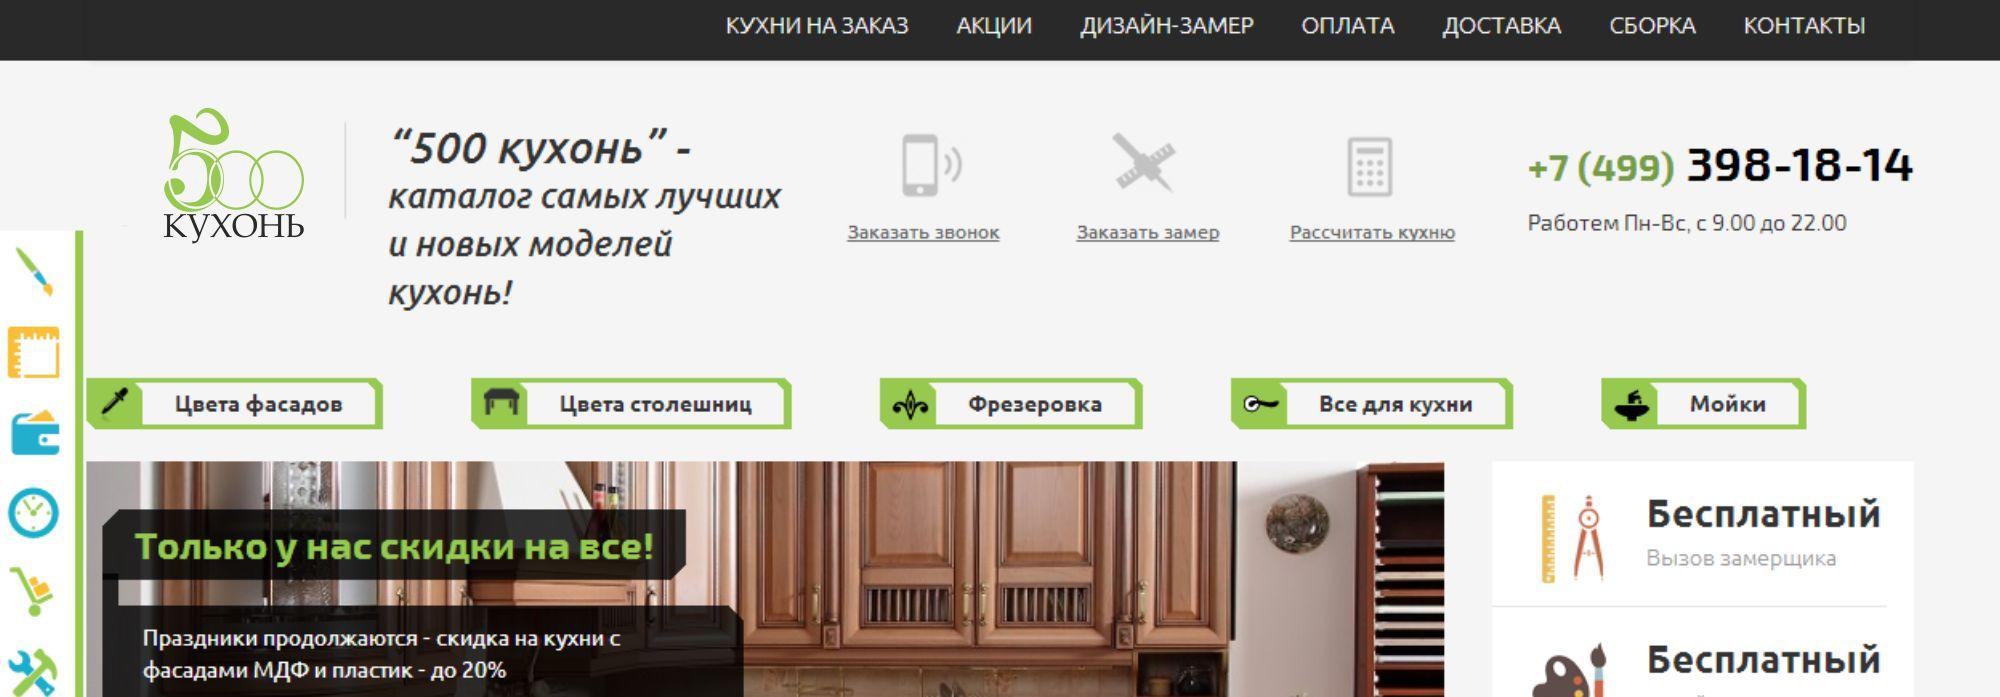 Логотип для интернет каталога кухонь - дизайнер byka-ve7rov